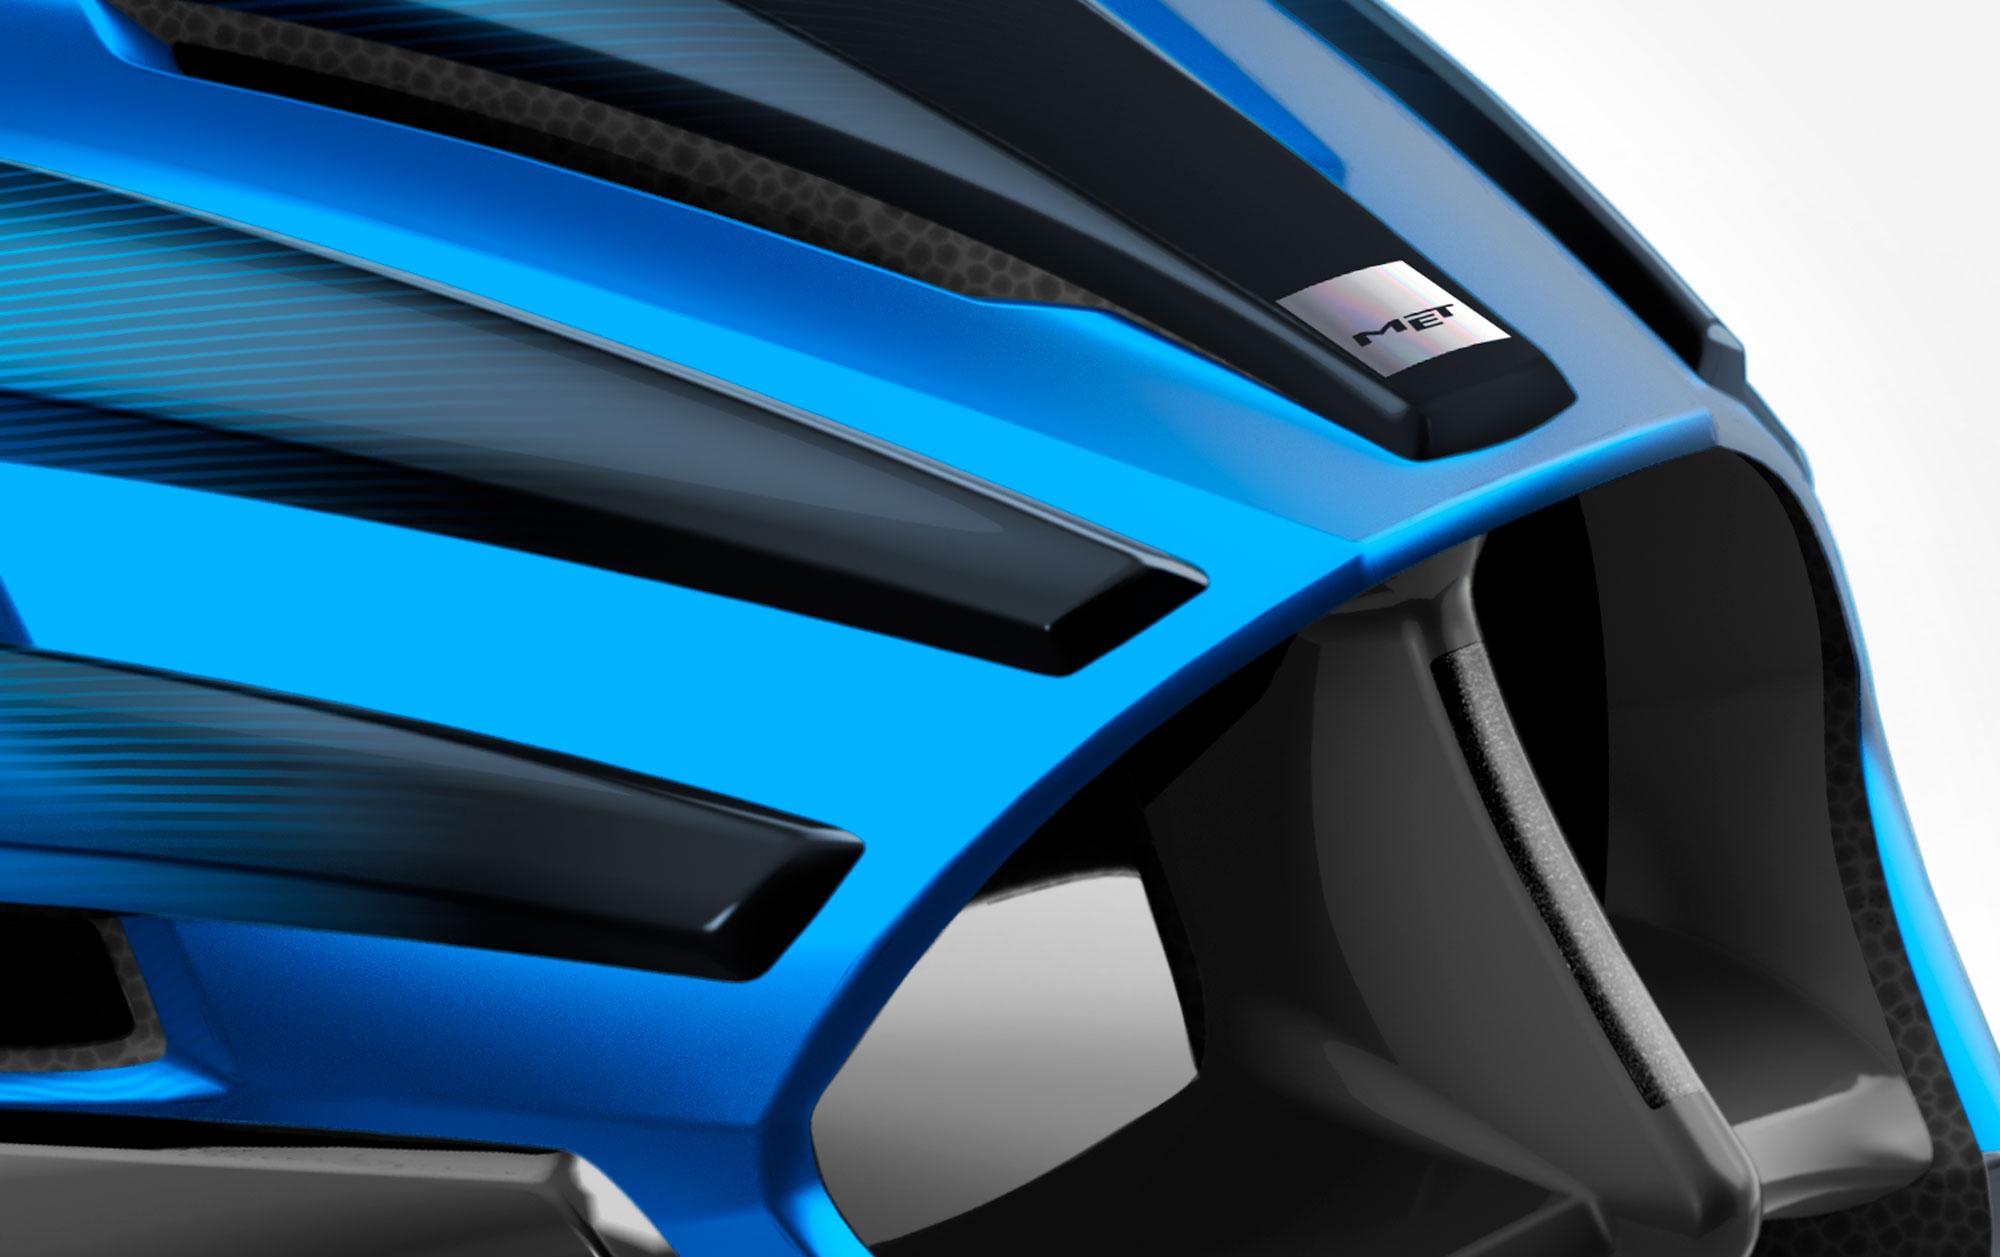 MET Trenta Road, Aero, Cyclocross and Gravel Helmet rear deflectors